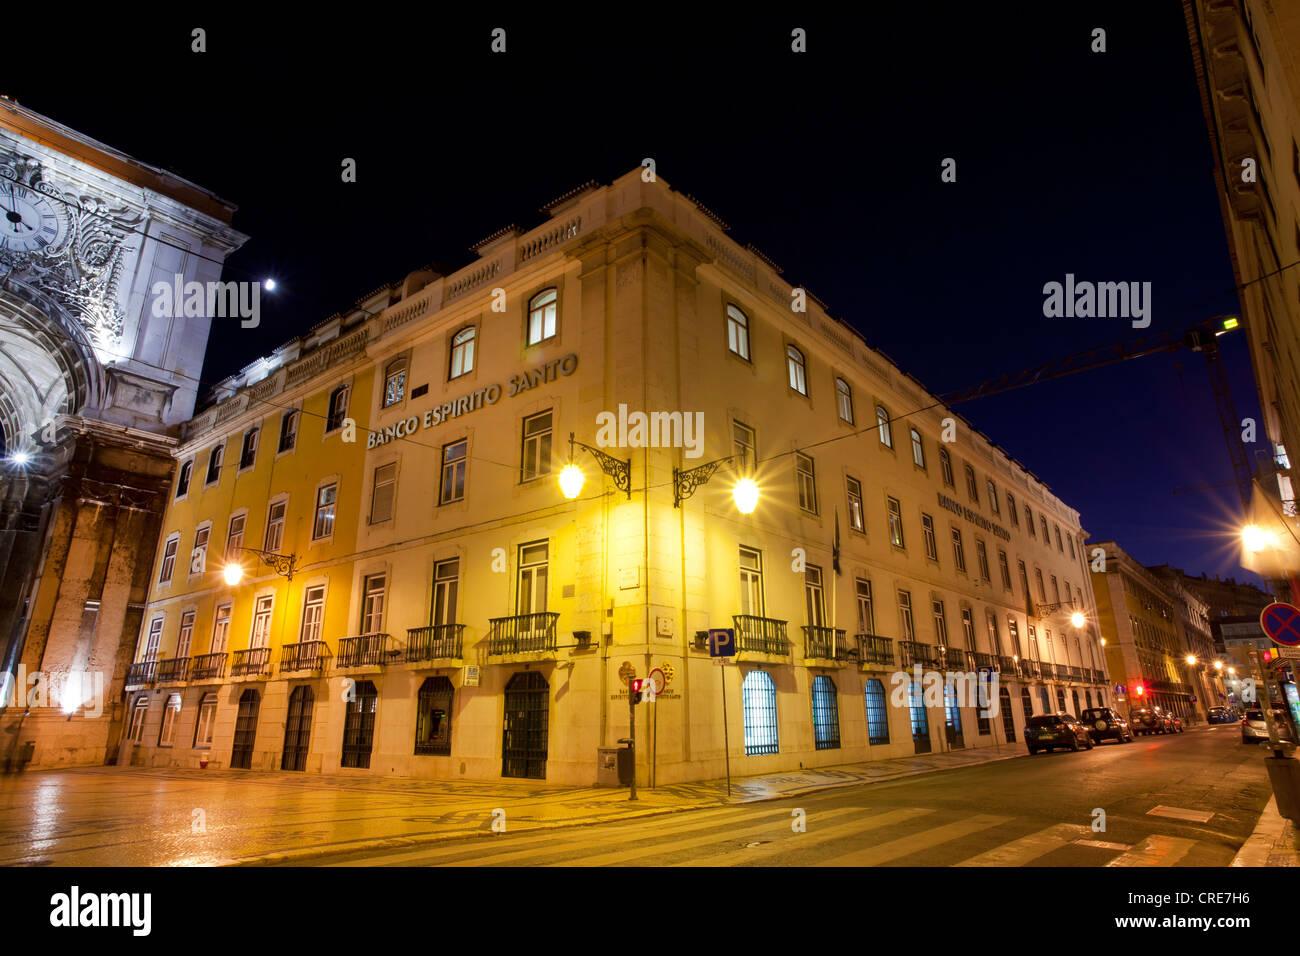 Branch of the Portuguese bank Banco Espirito Santo, BES, at night, Lisbon, Portugal, Europe - Stock Image